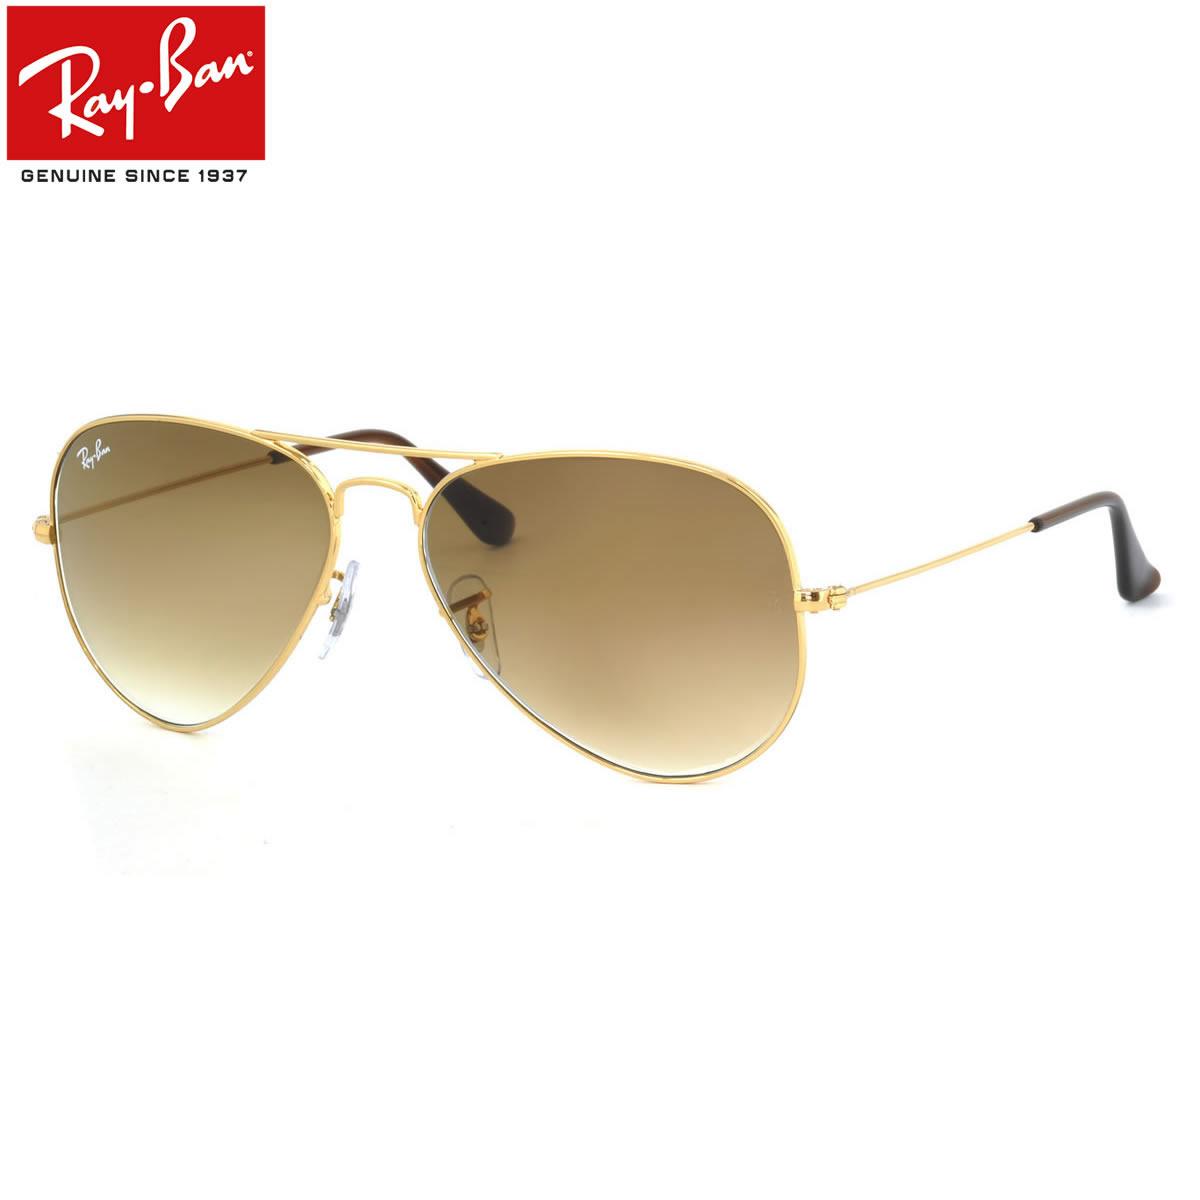 37616563595f Optical Shop Thats: レイバンサングラスアビエーター Ray-Ban RB3025 ...